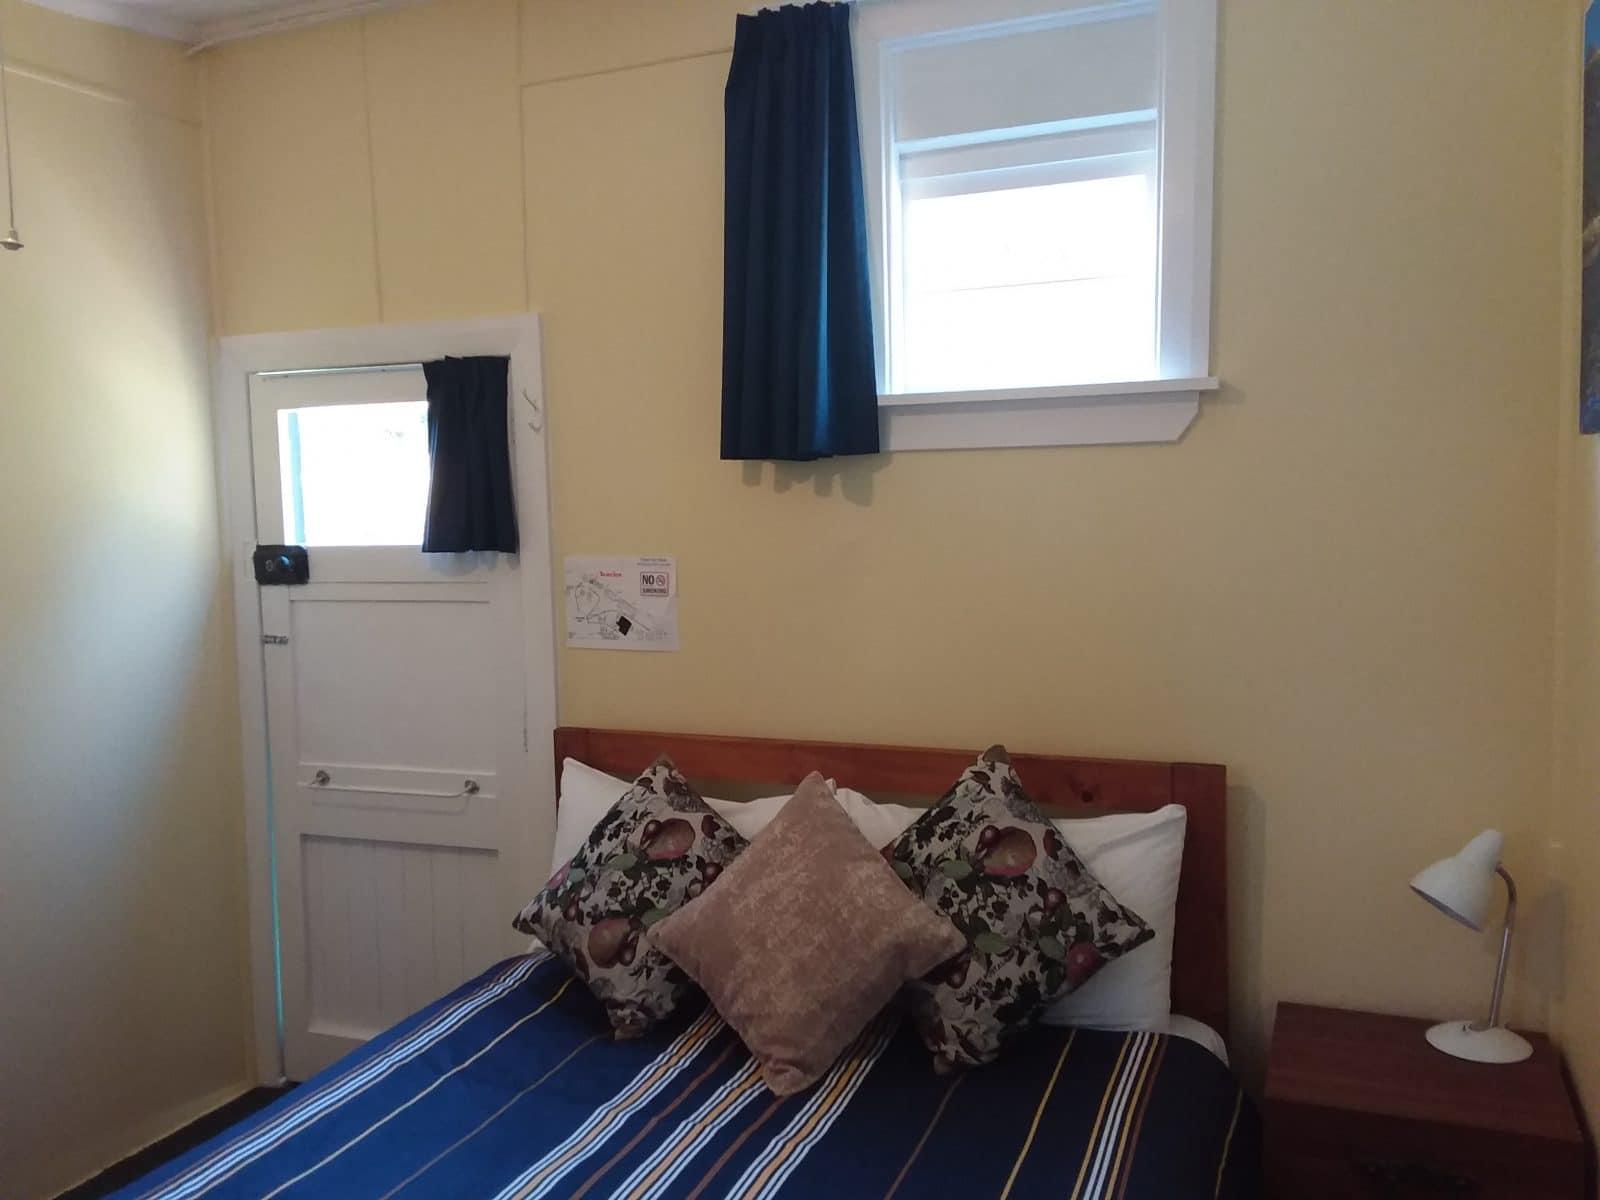 Cabin 4 pic 1